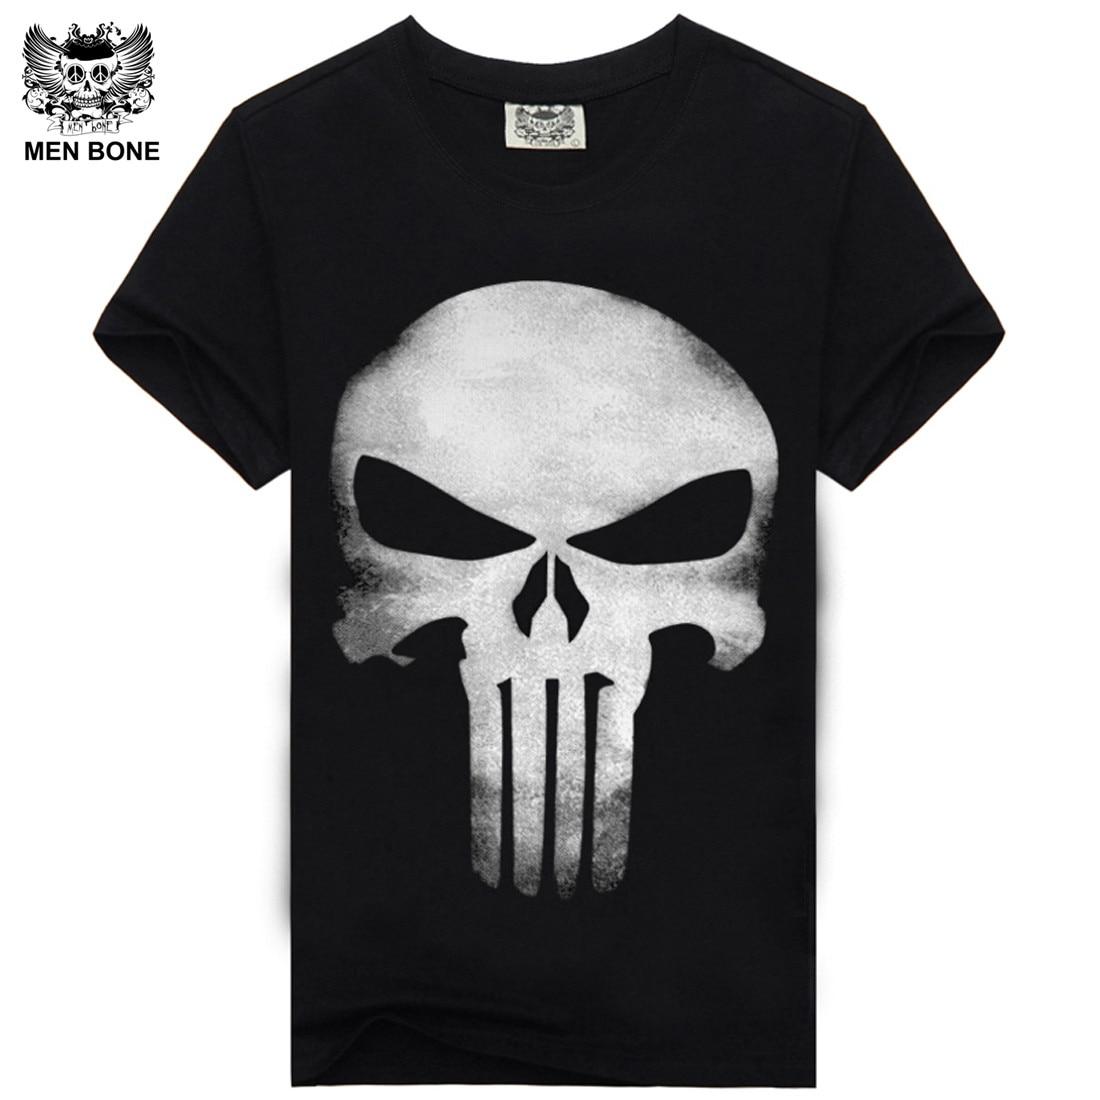 [Mannen bone] Hot 100% Katoenen T-shirt Mannelijke Modemerk rock - Herenkleding - Foto 5